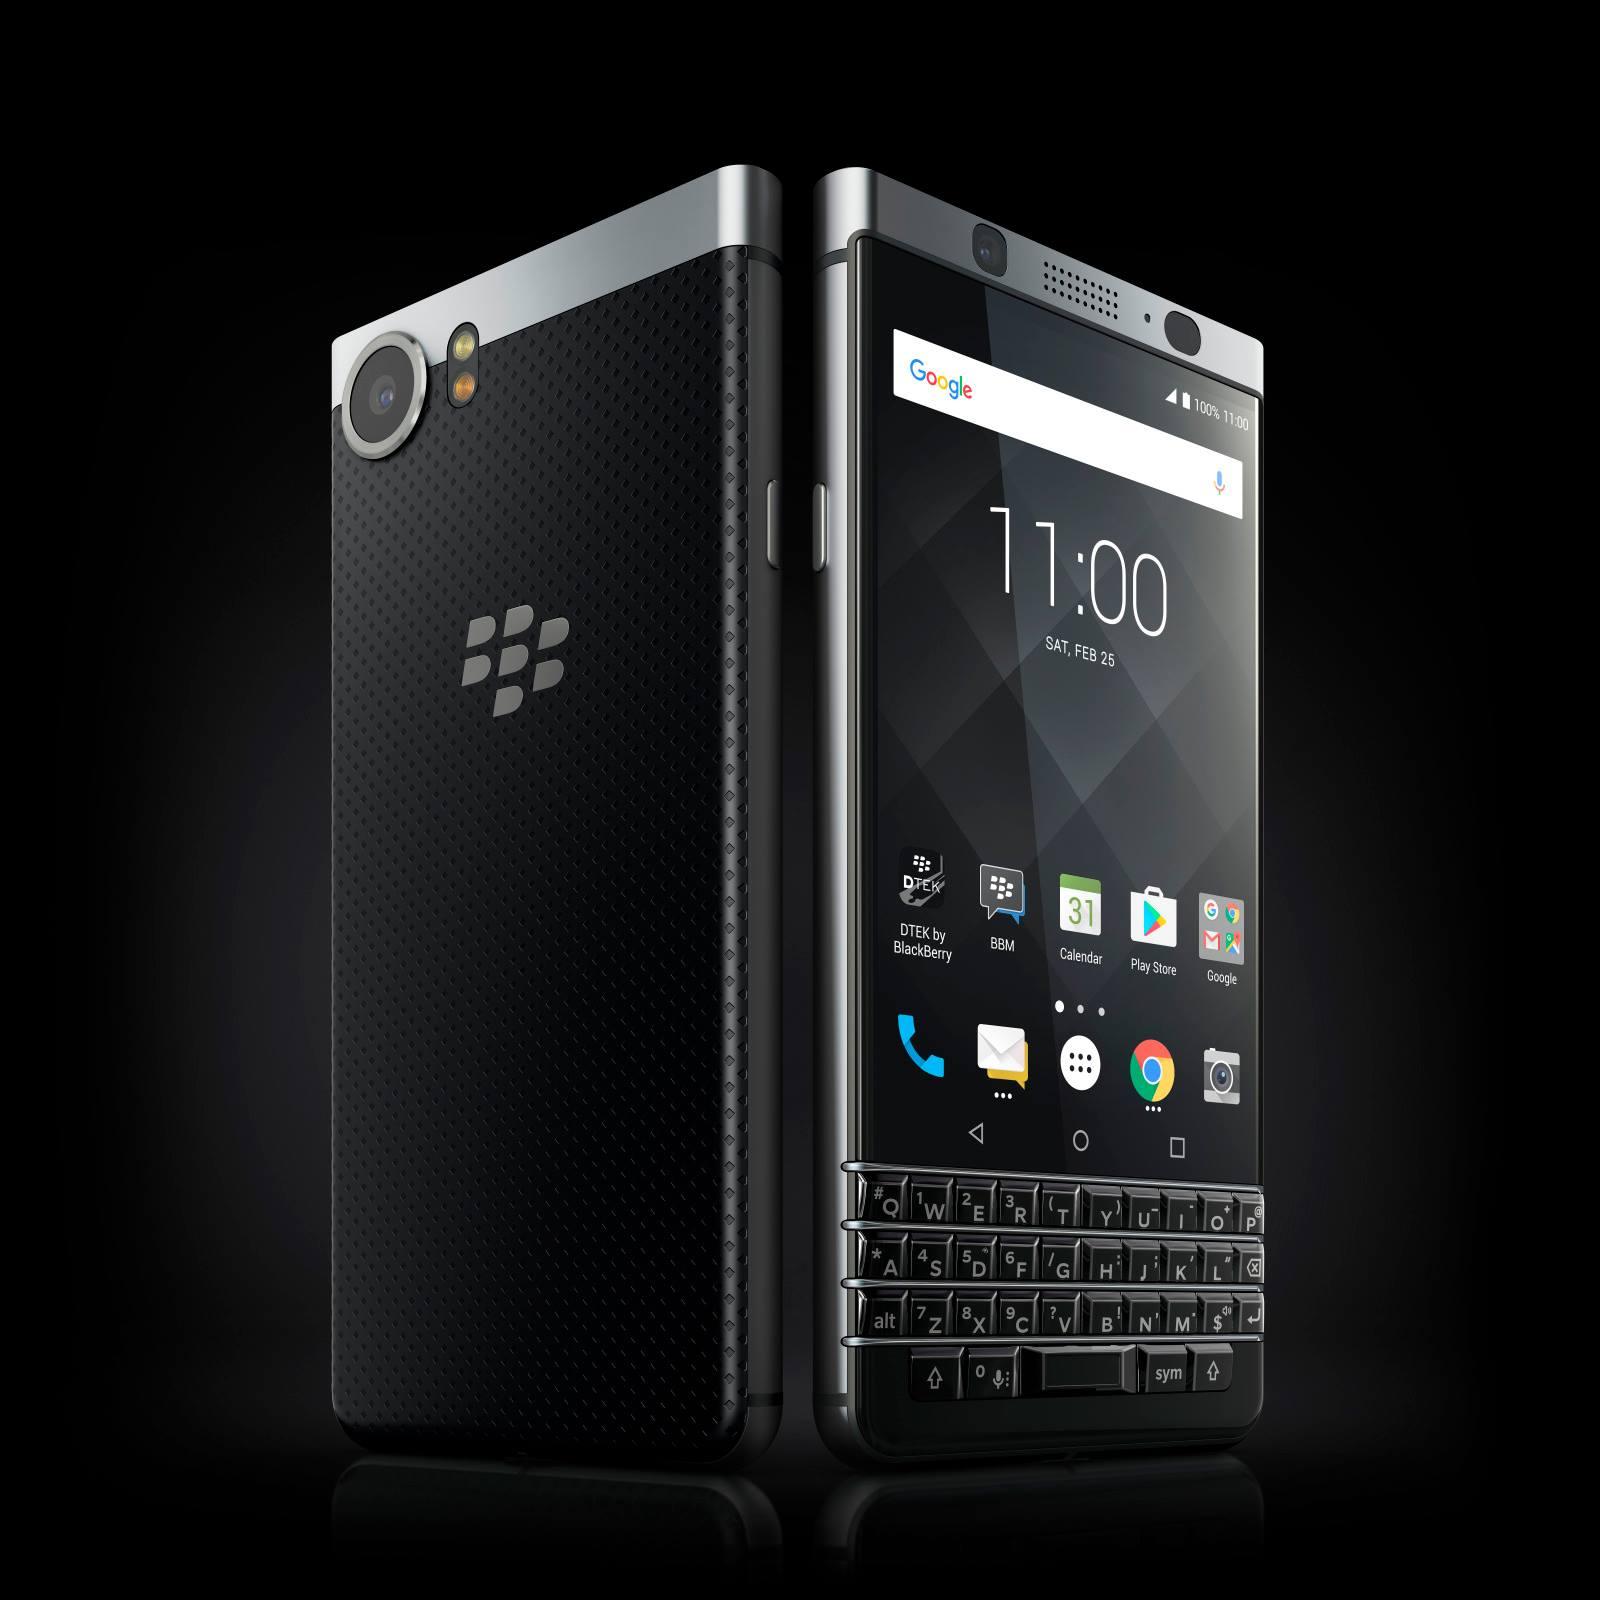 A BlackBerry KeyOne smartphone